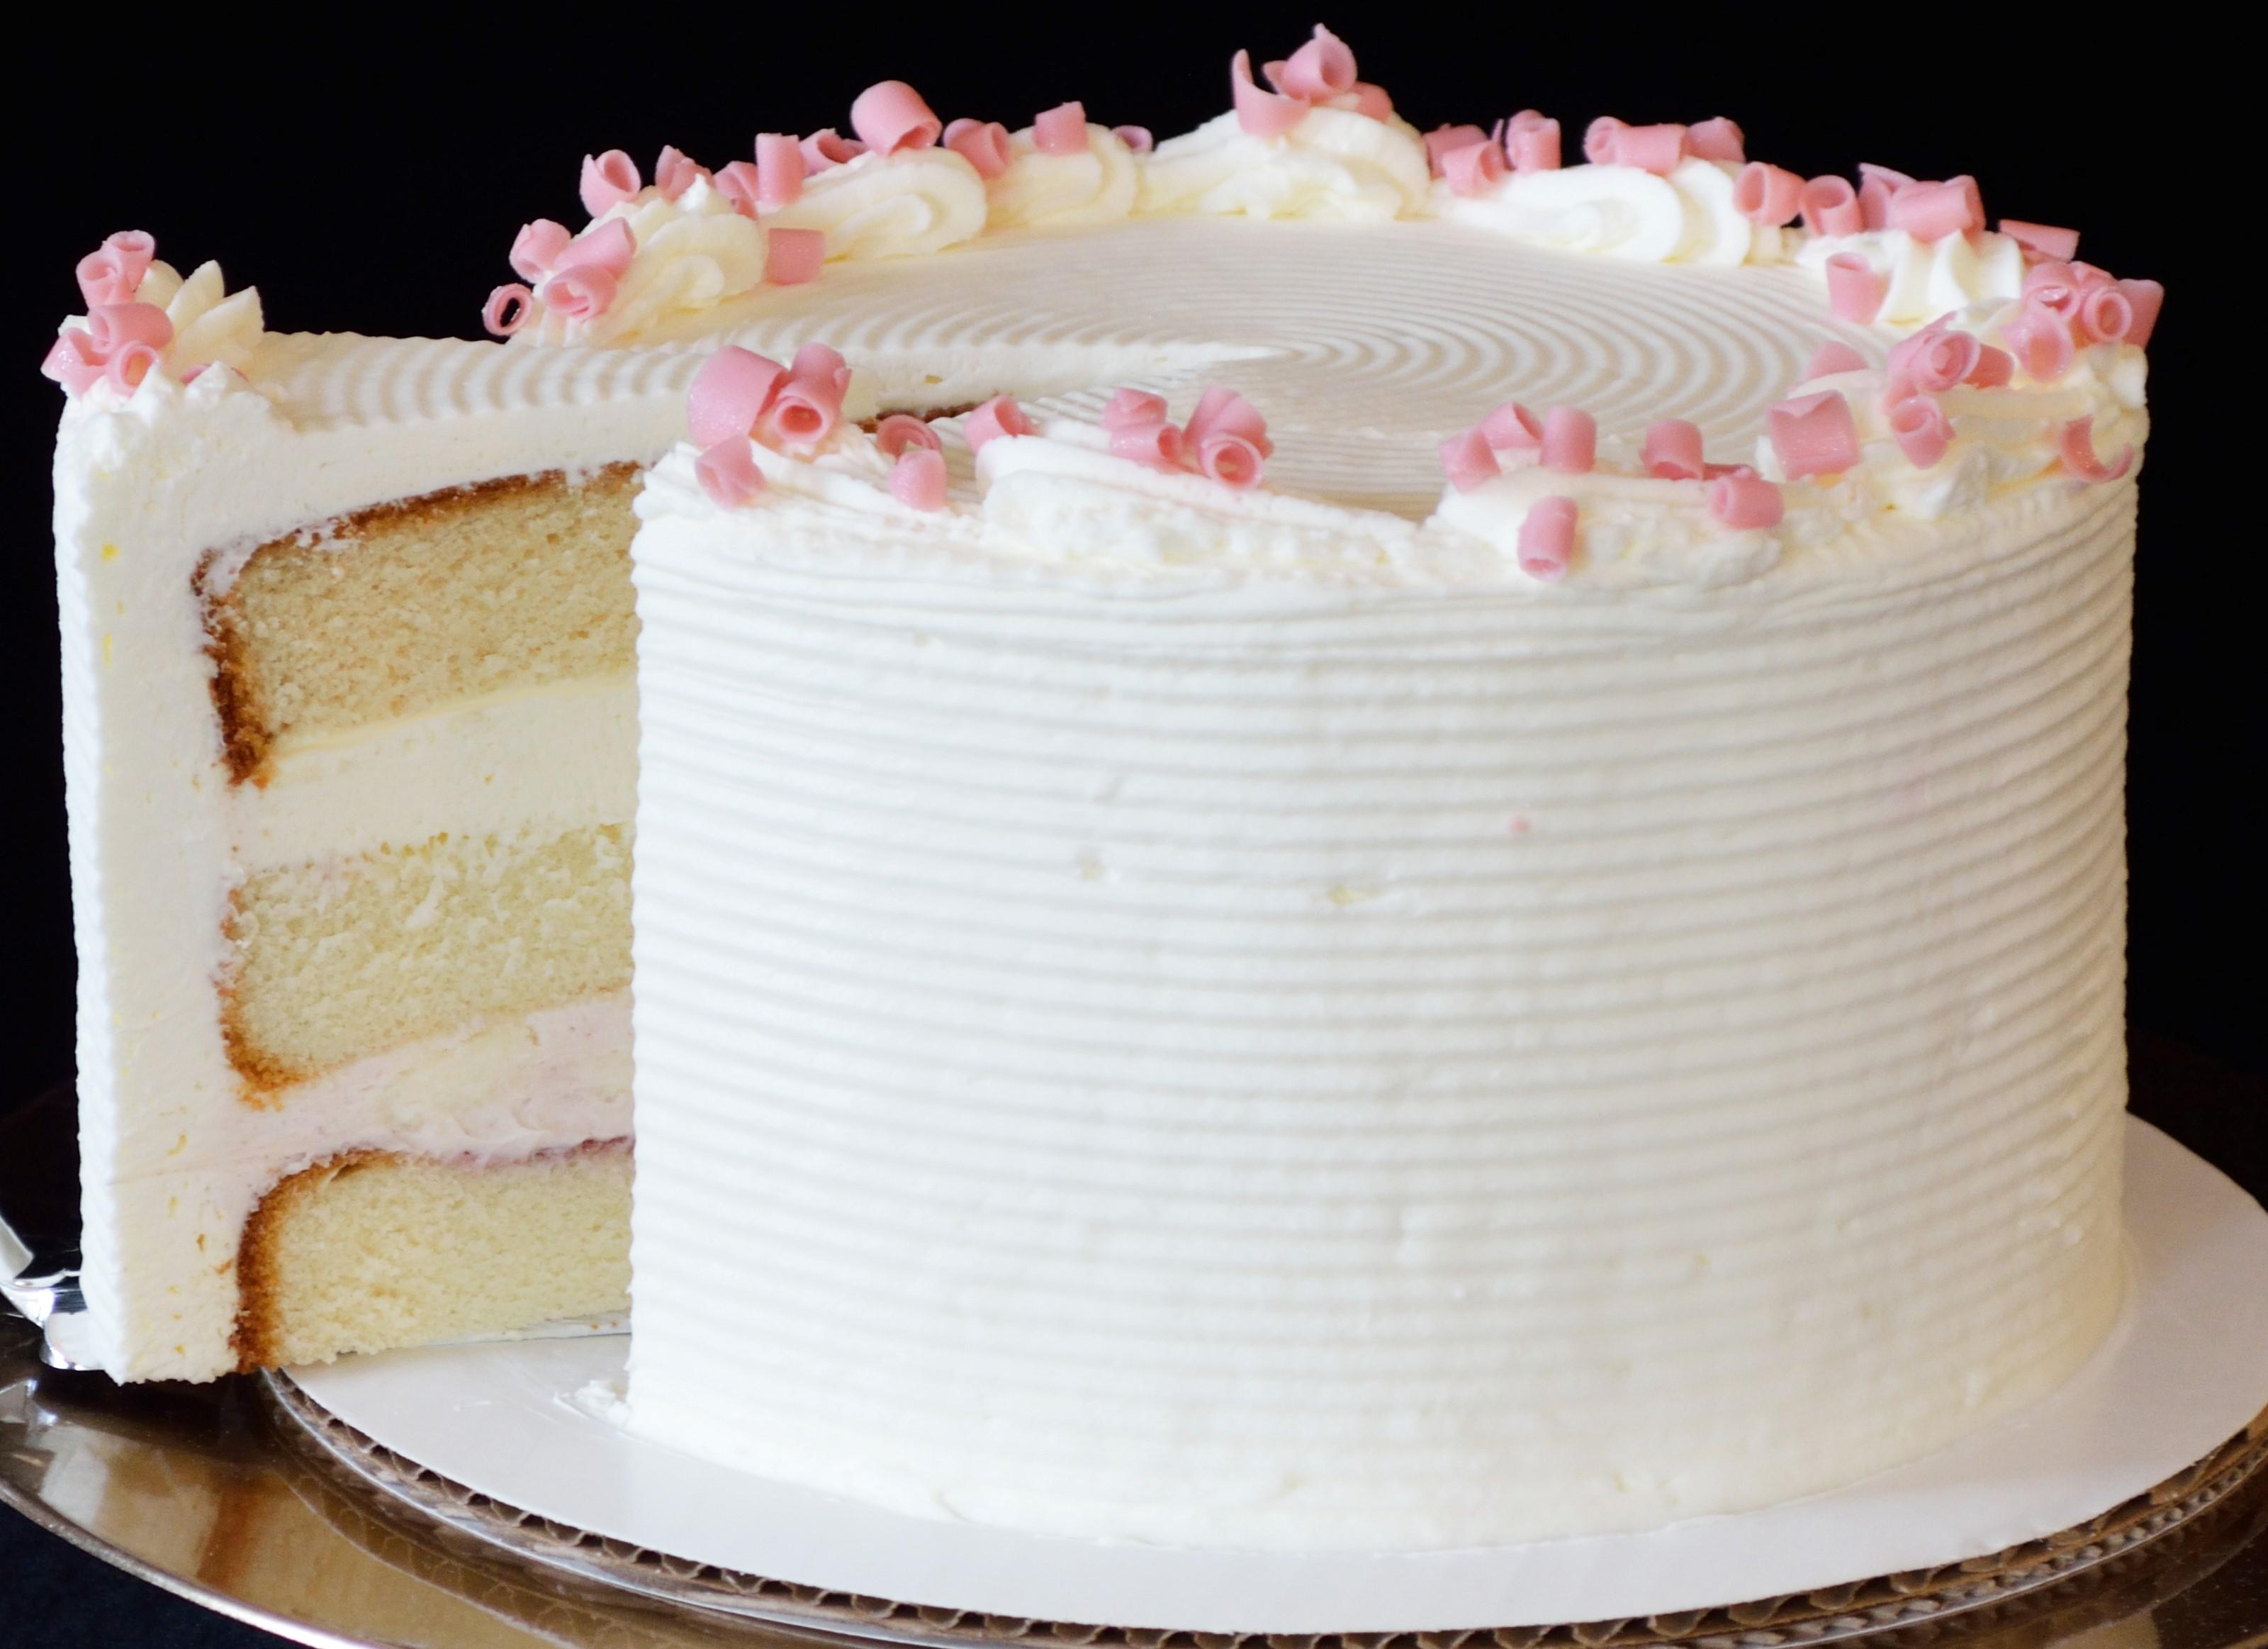 Lemon Cake With Strawberry Mousse Filling